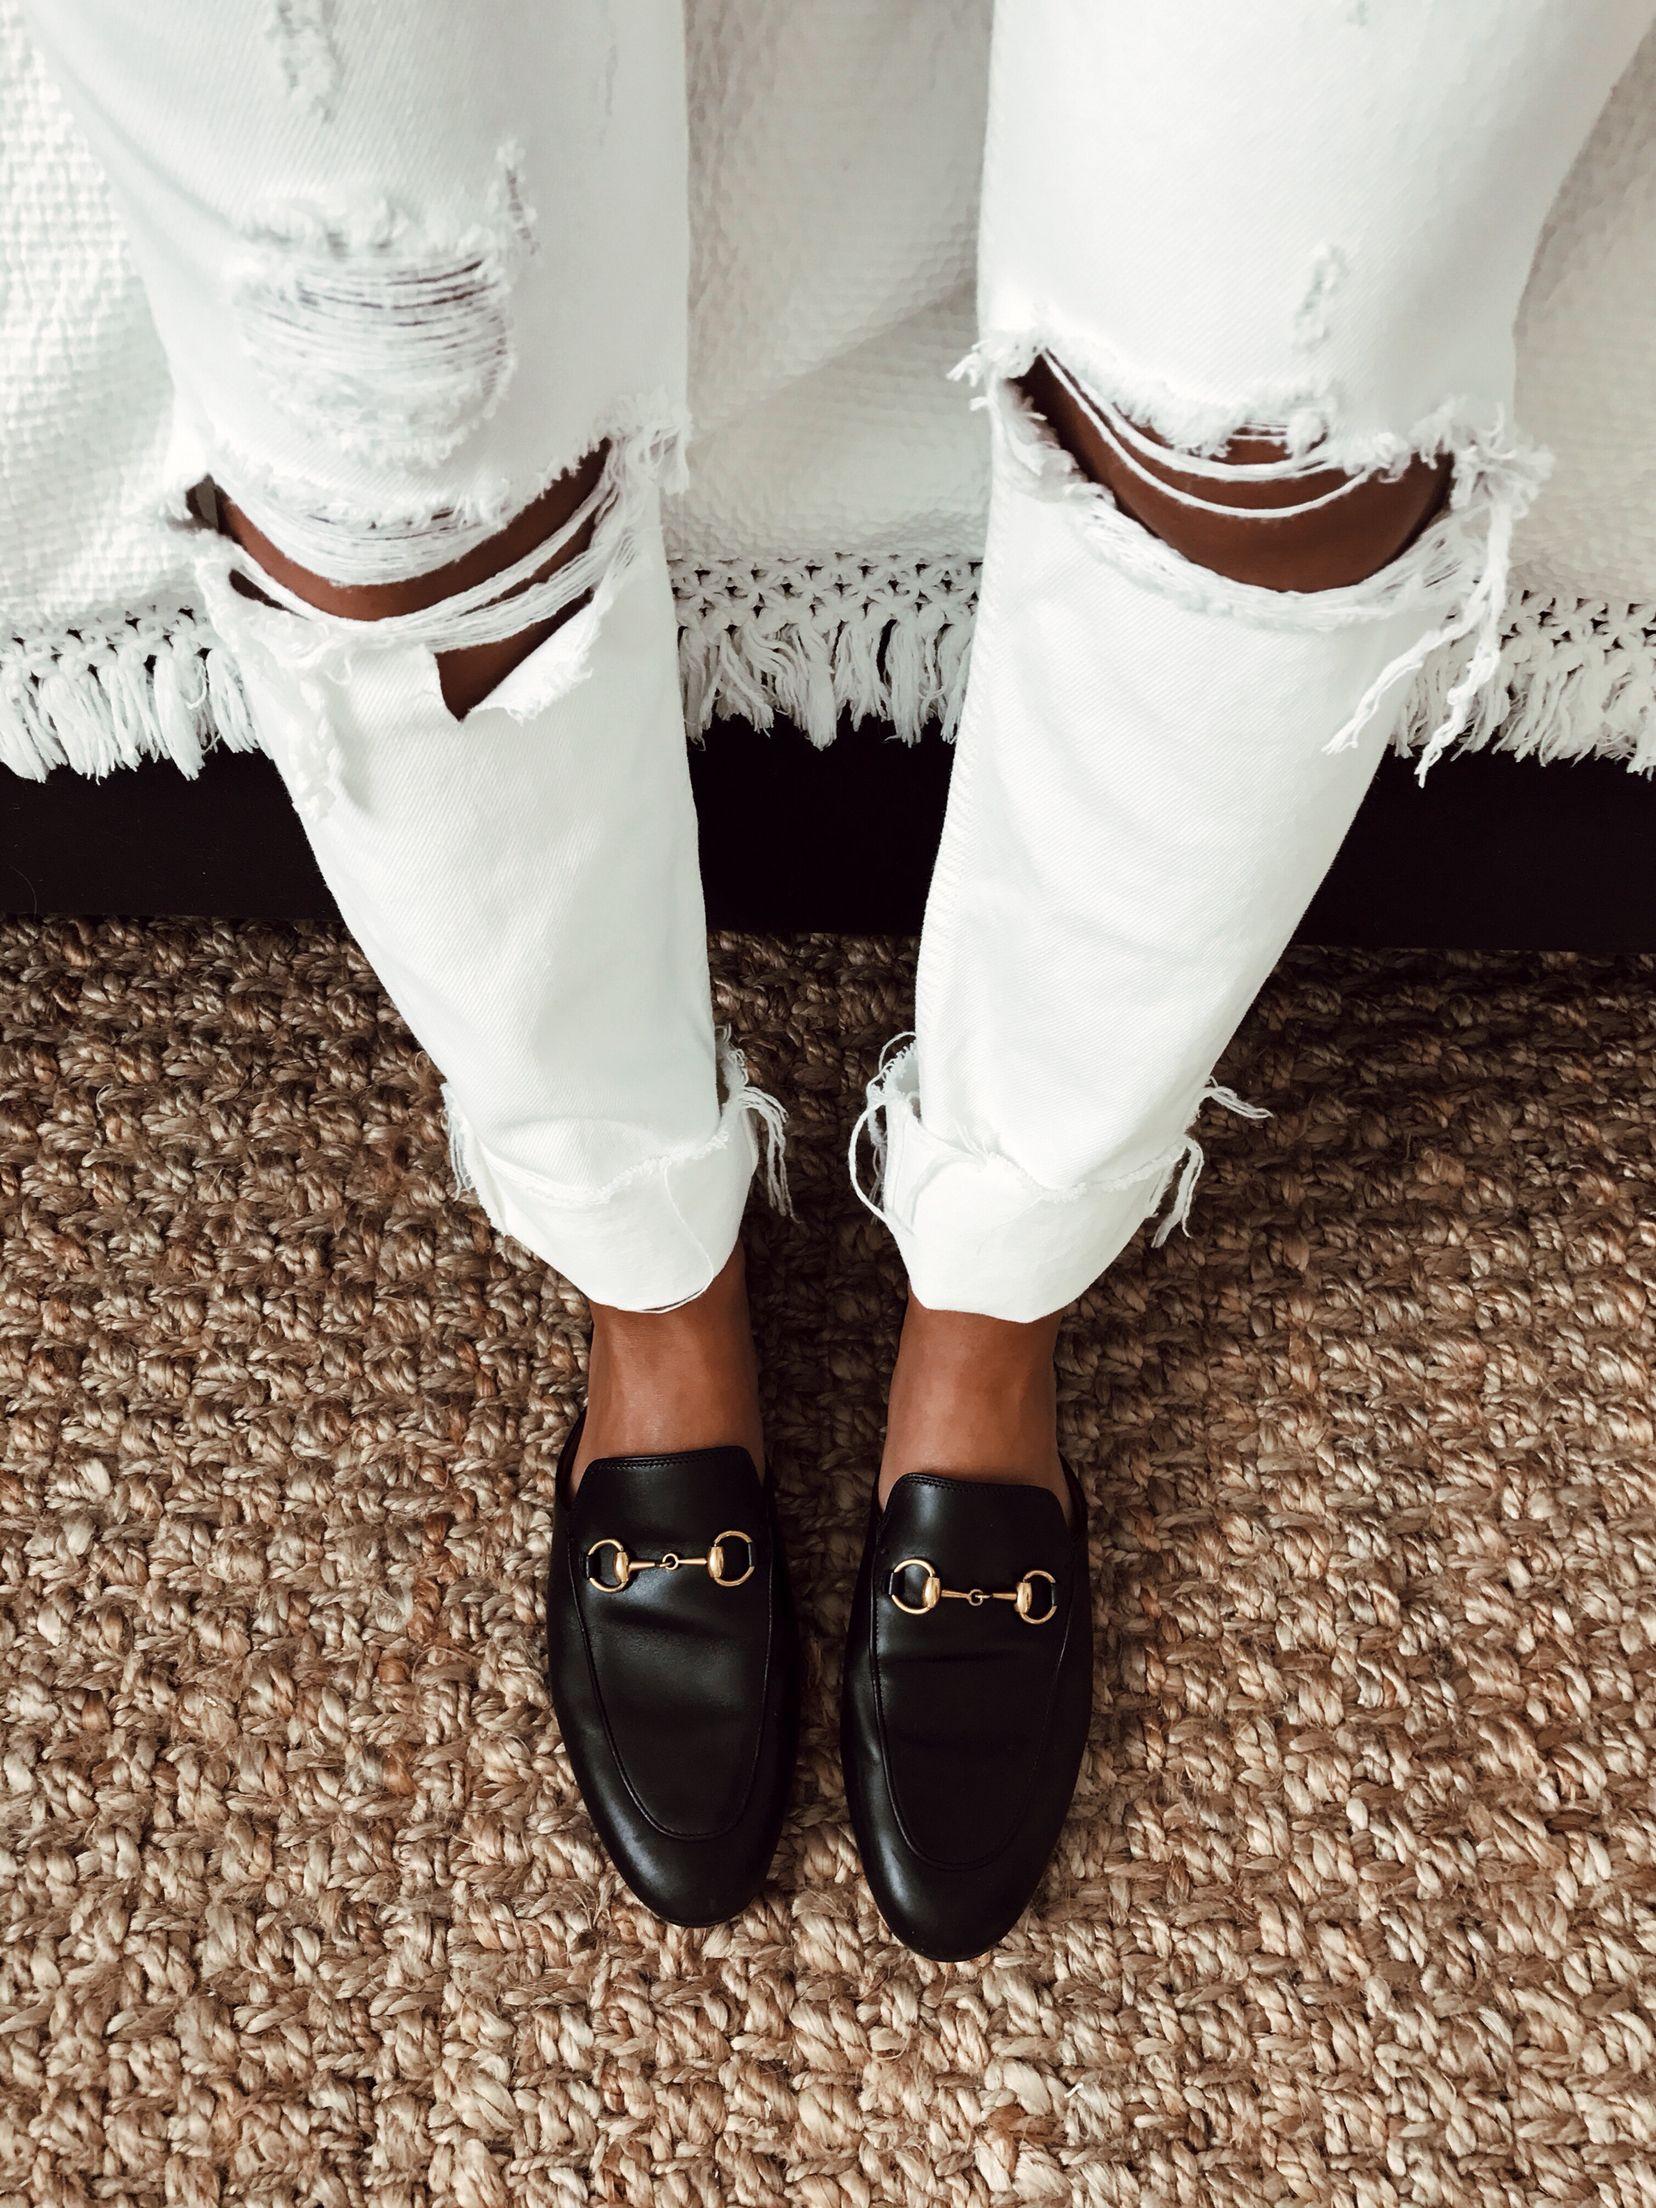 Gucci slides | Gucci, Stylish shoes